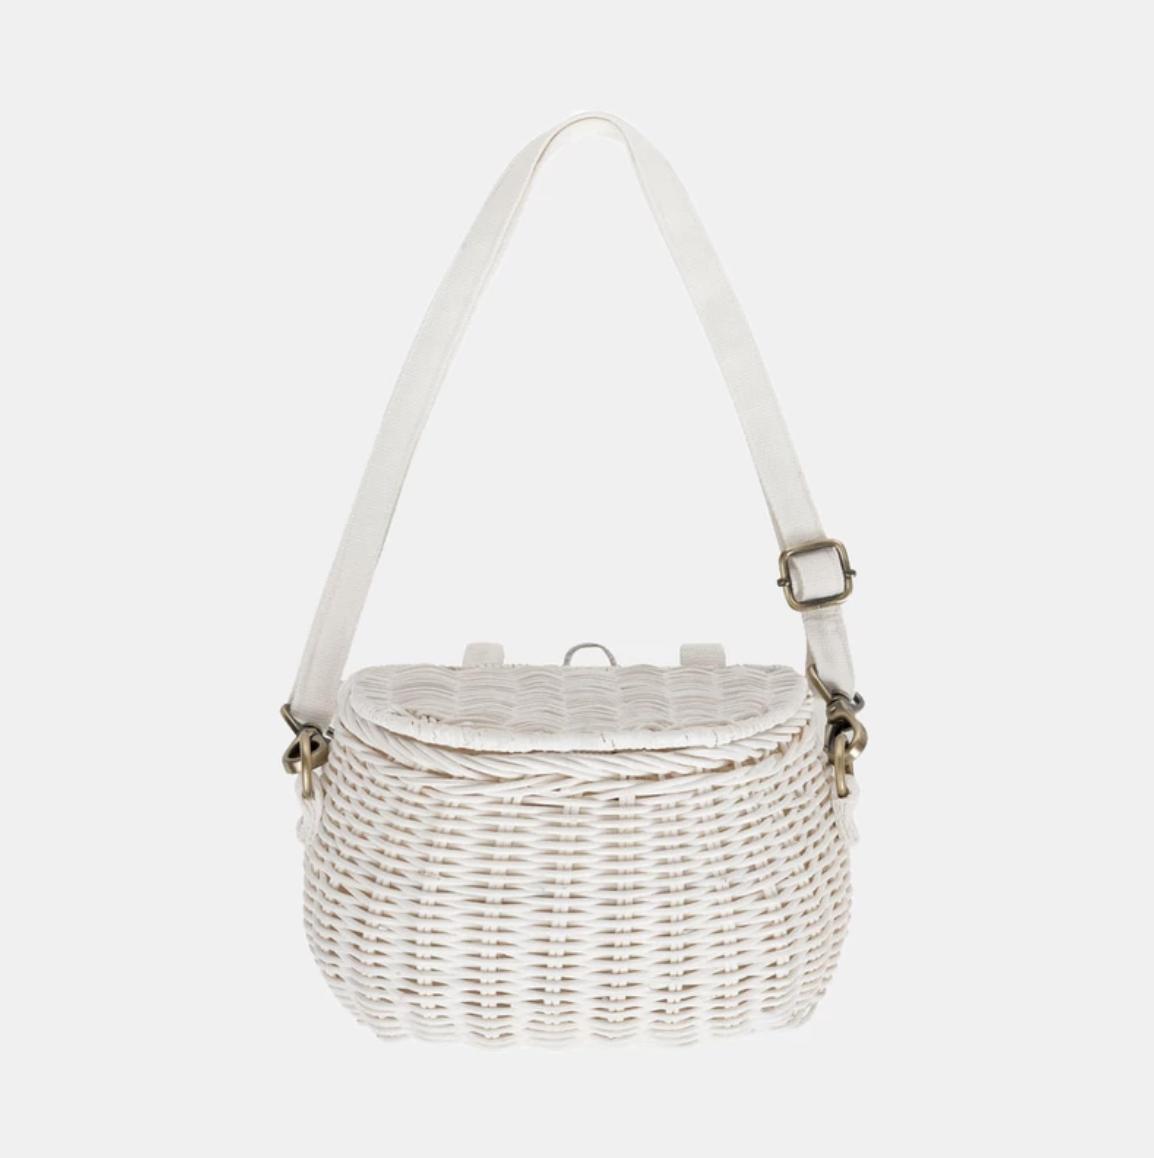 Olli Ella - Mini Chari Basket (white only)